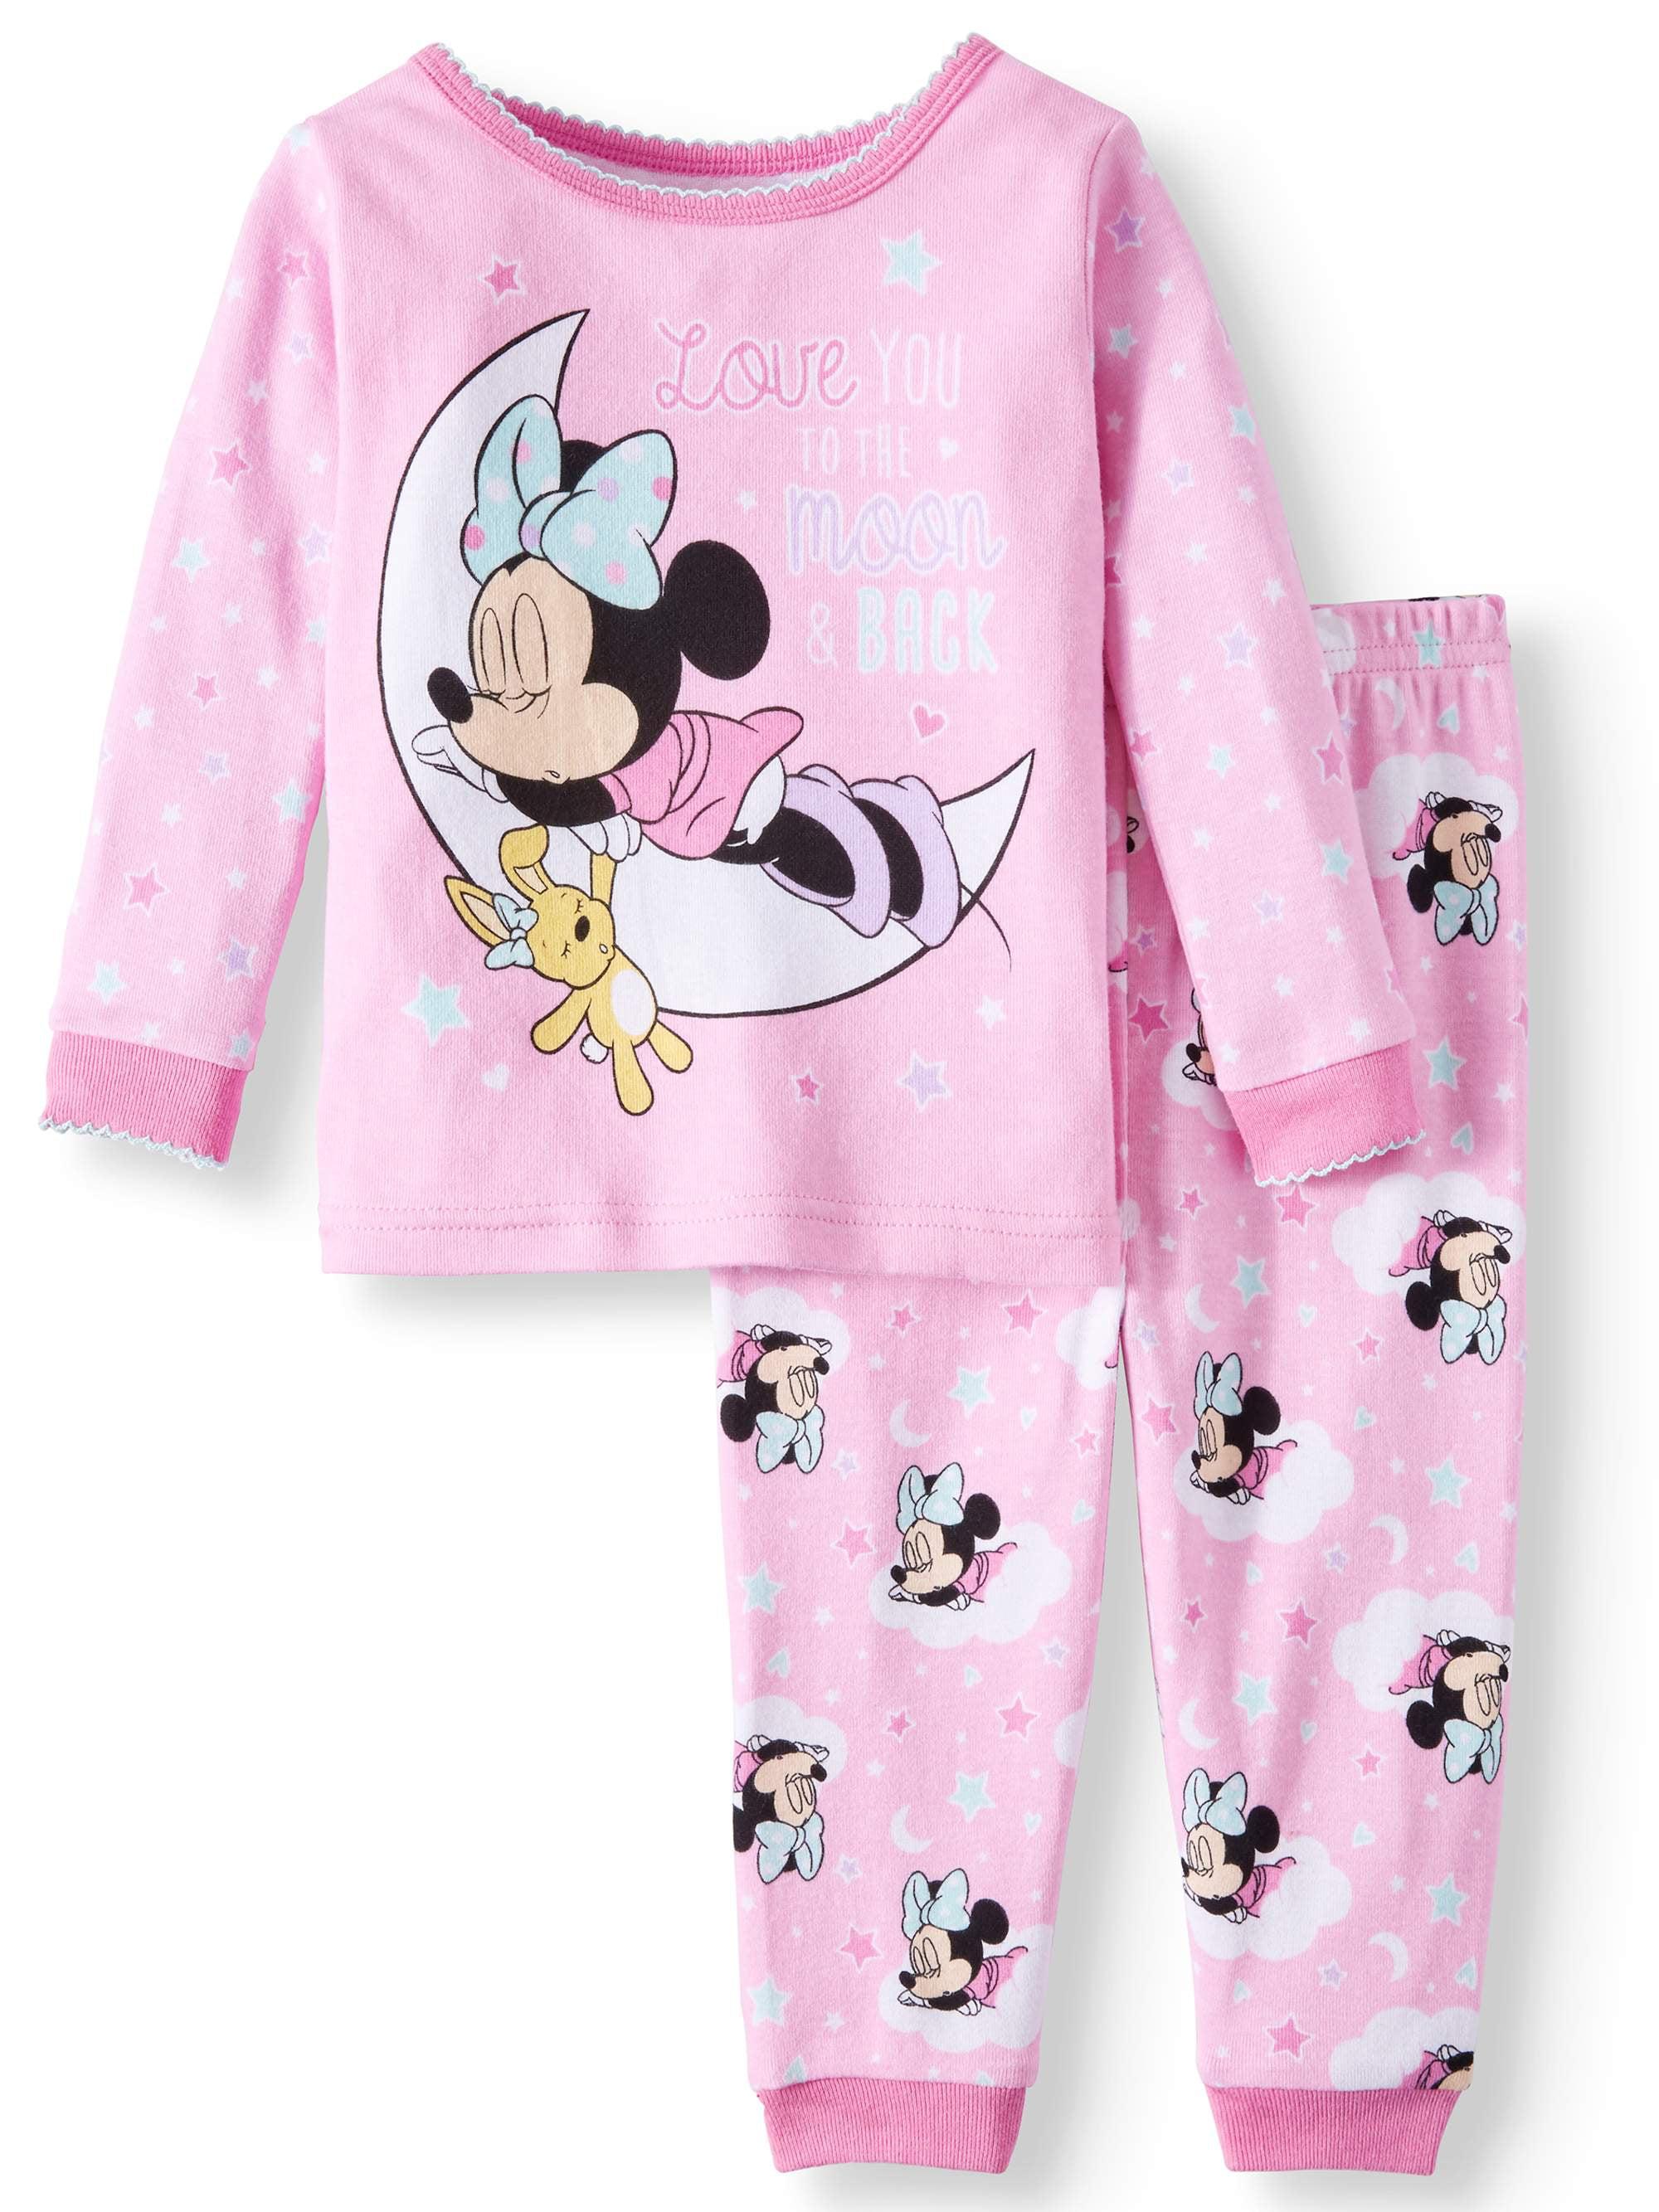 Minnie Mouse Baby Girls' Cotton Tight Fit Pajamas, 2-Piece Set